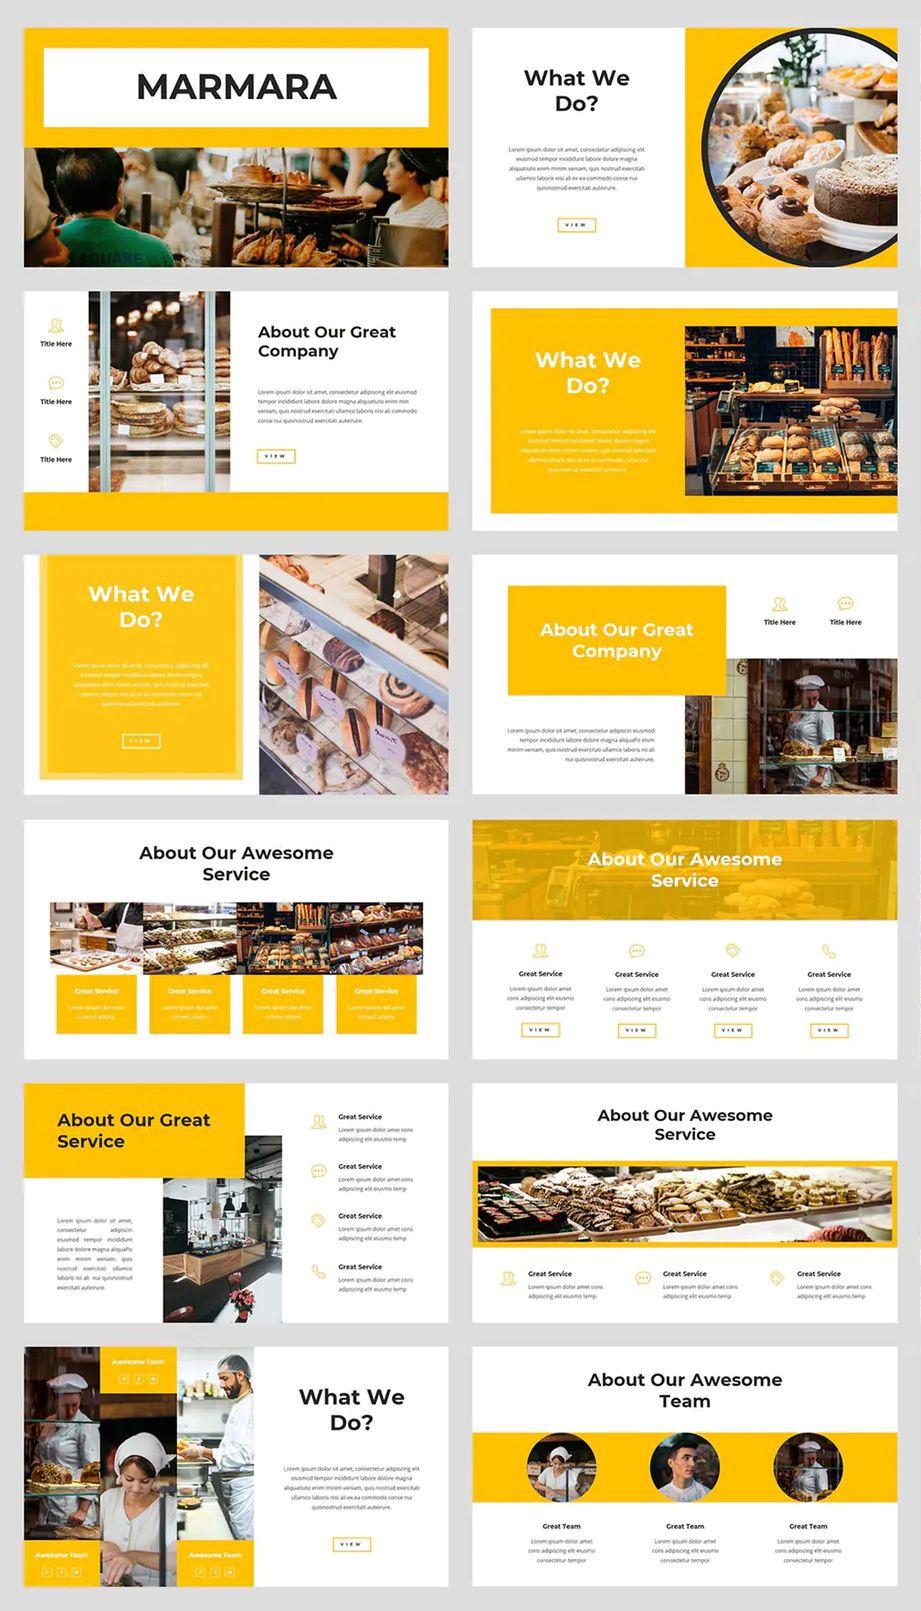 Bakery Powerpoint Template 36 Slides Powerpoint Presentation Design Powerpoint Design Templates Powerpoint Design